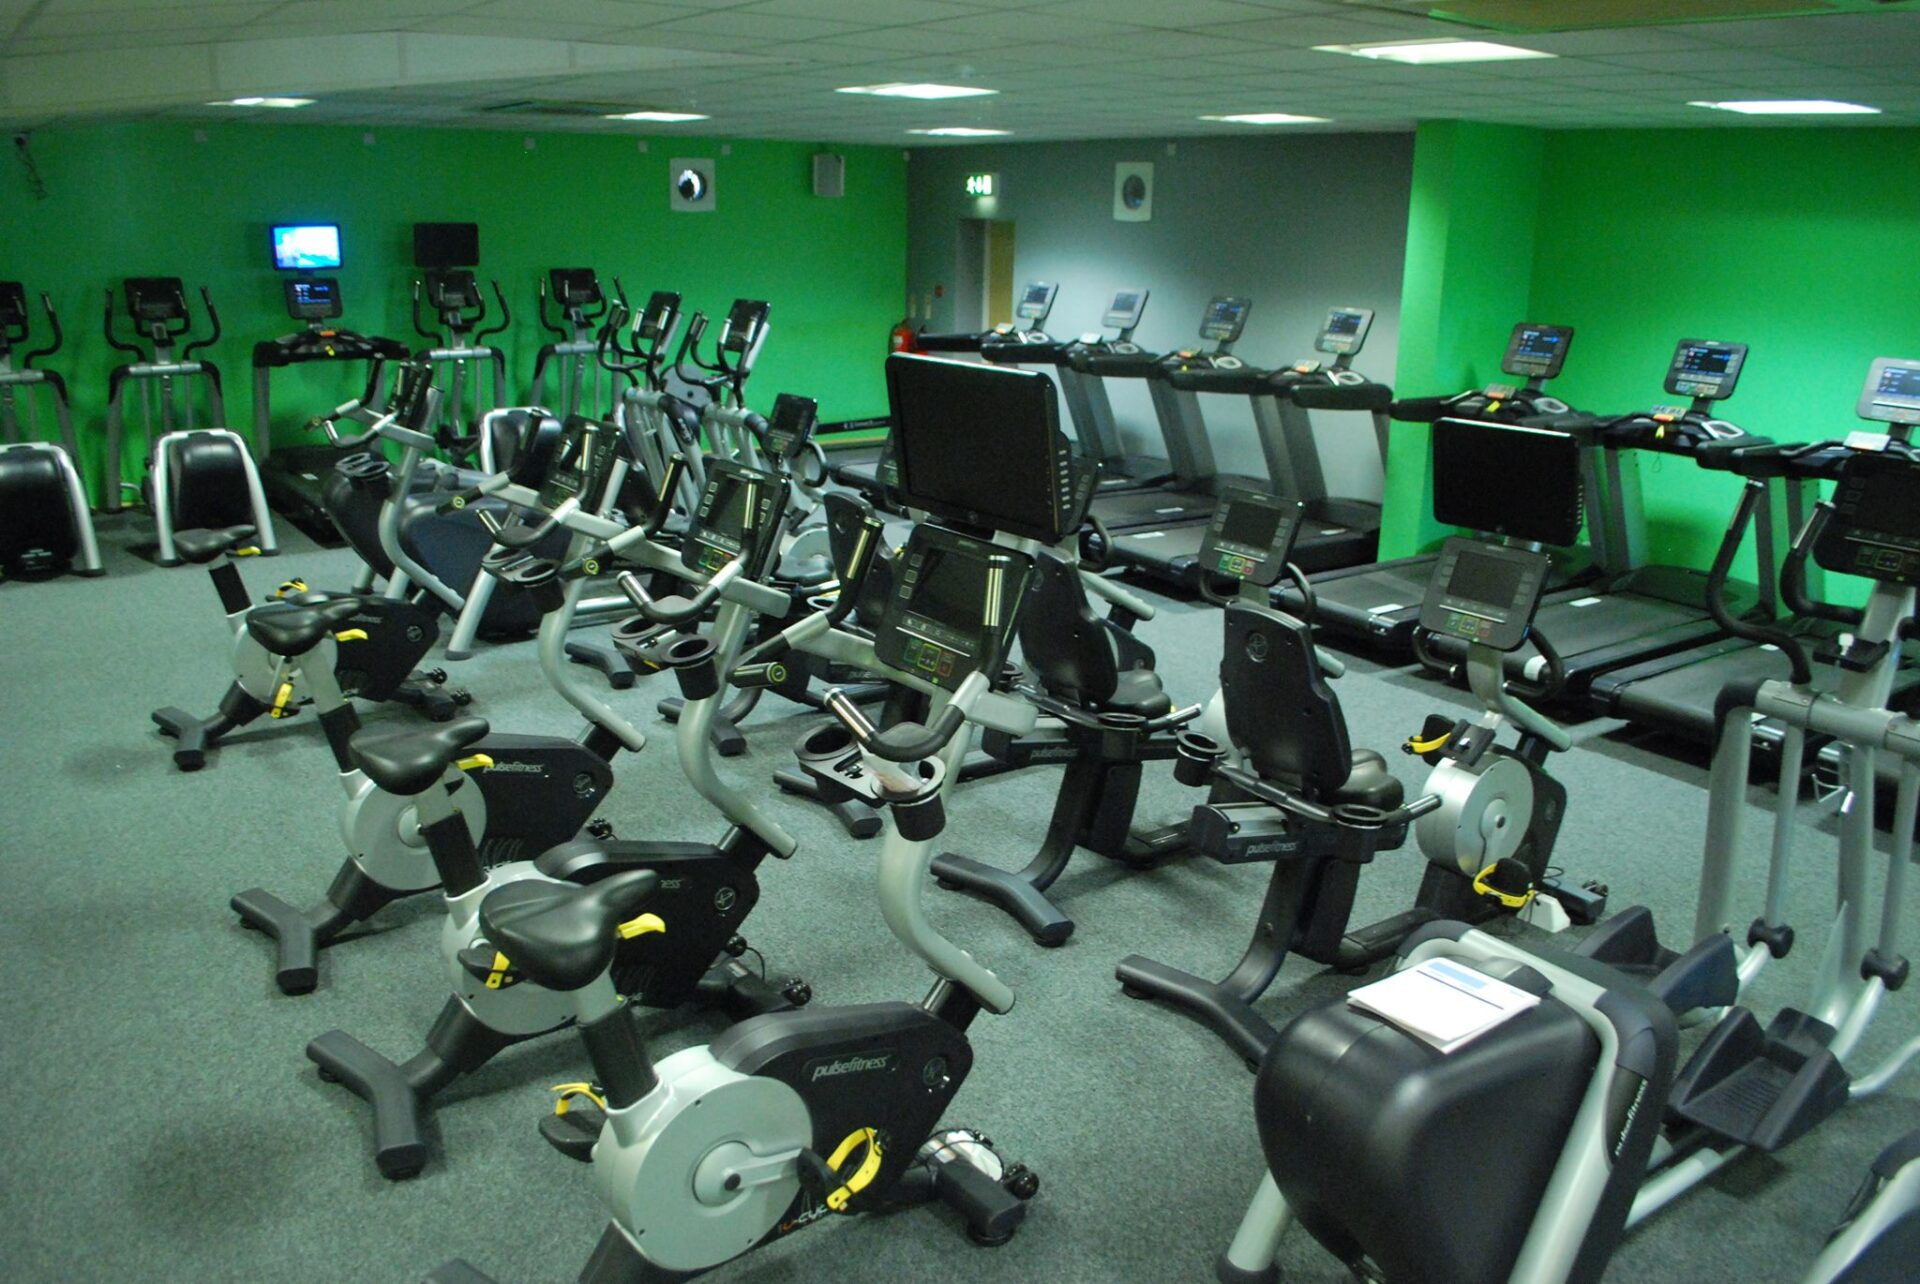 Helio Fitness Blackpool